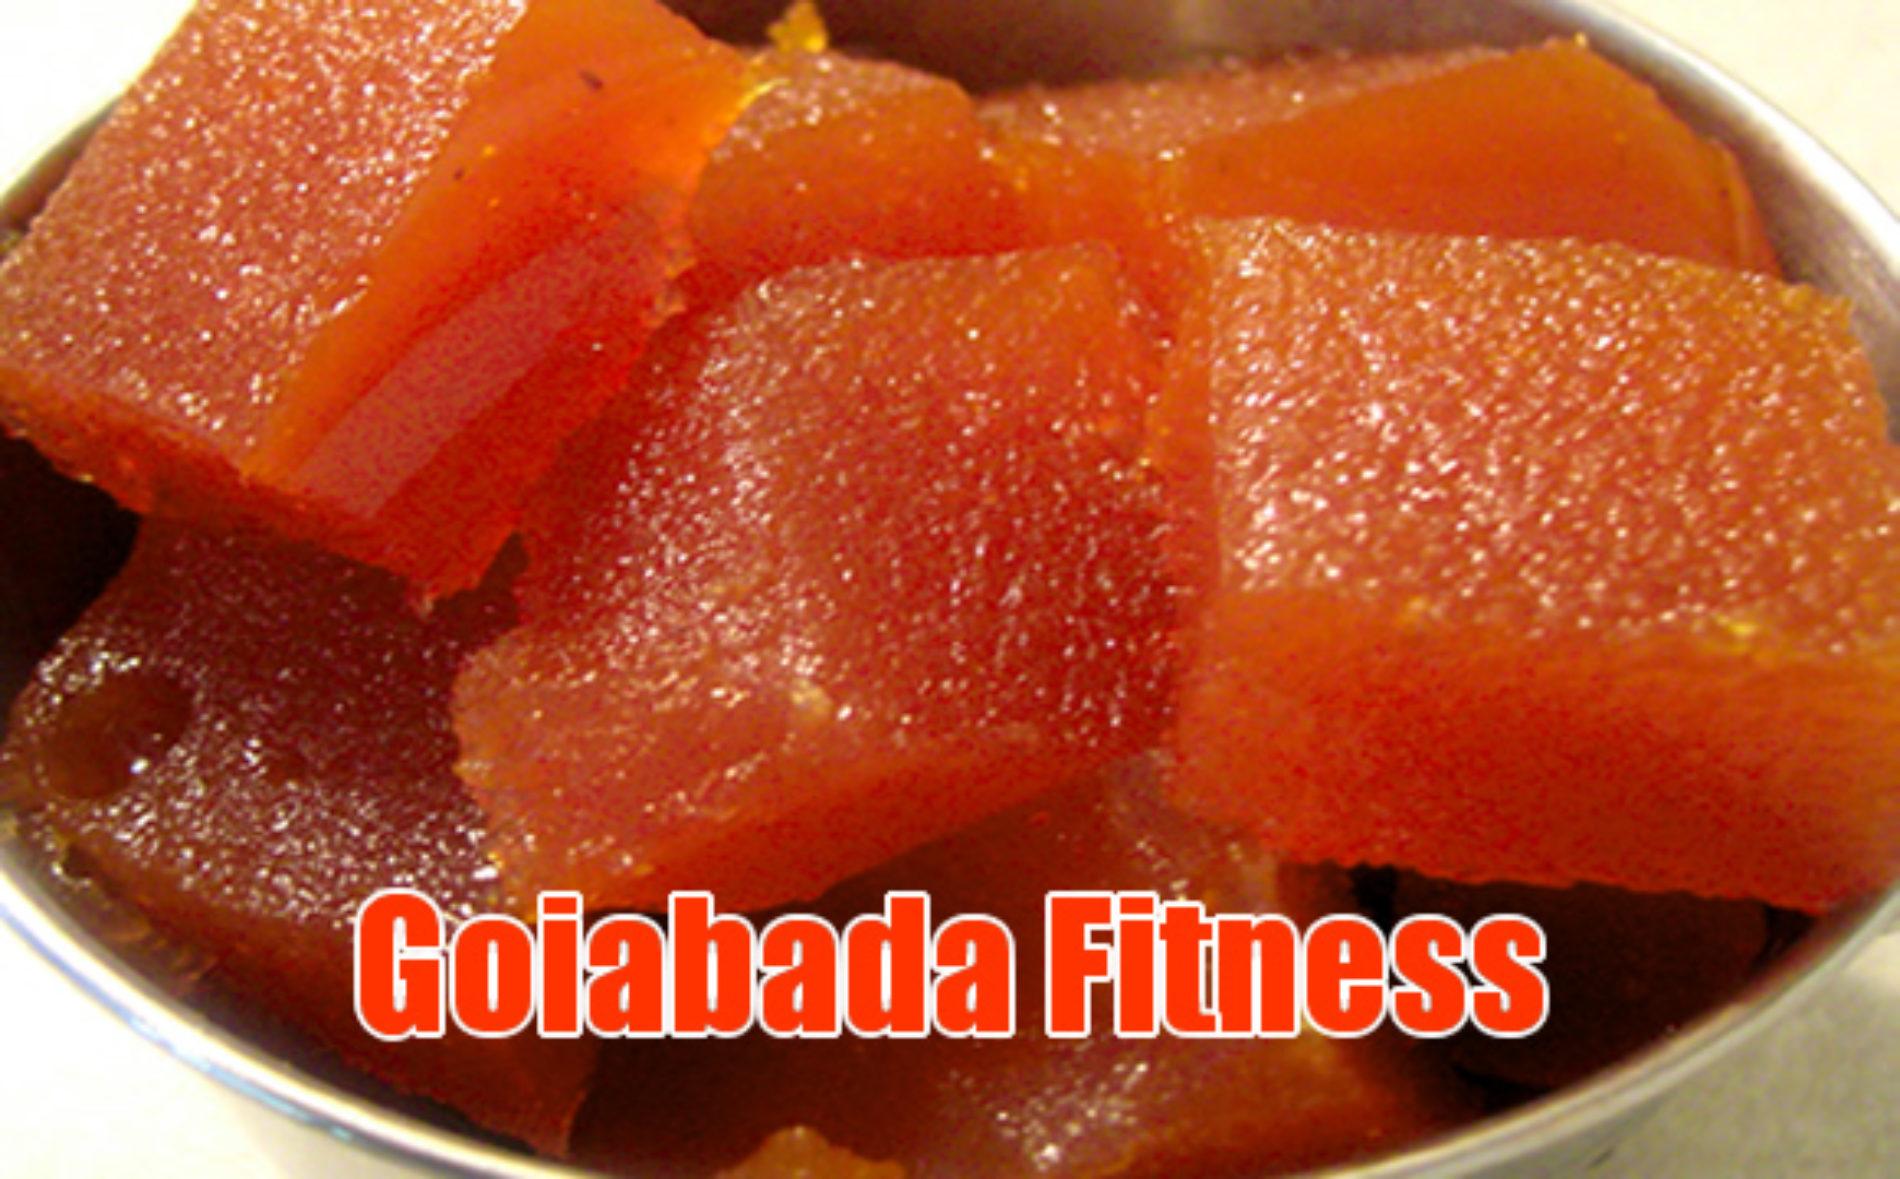 Goiabada fitness